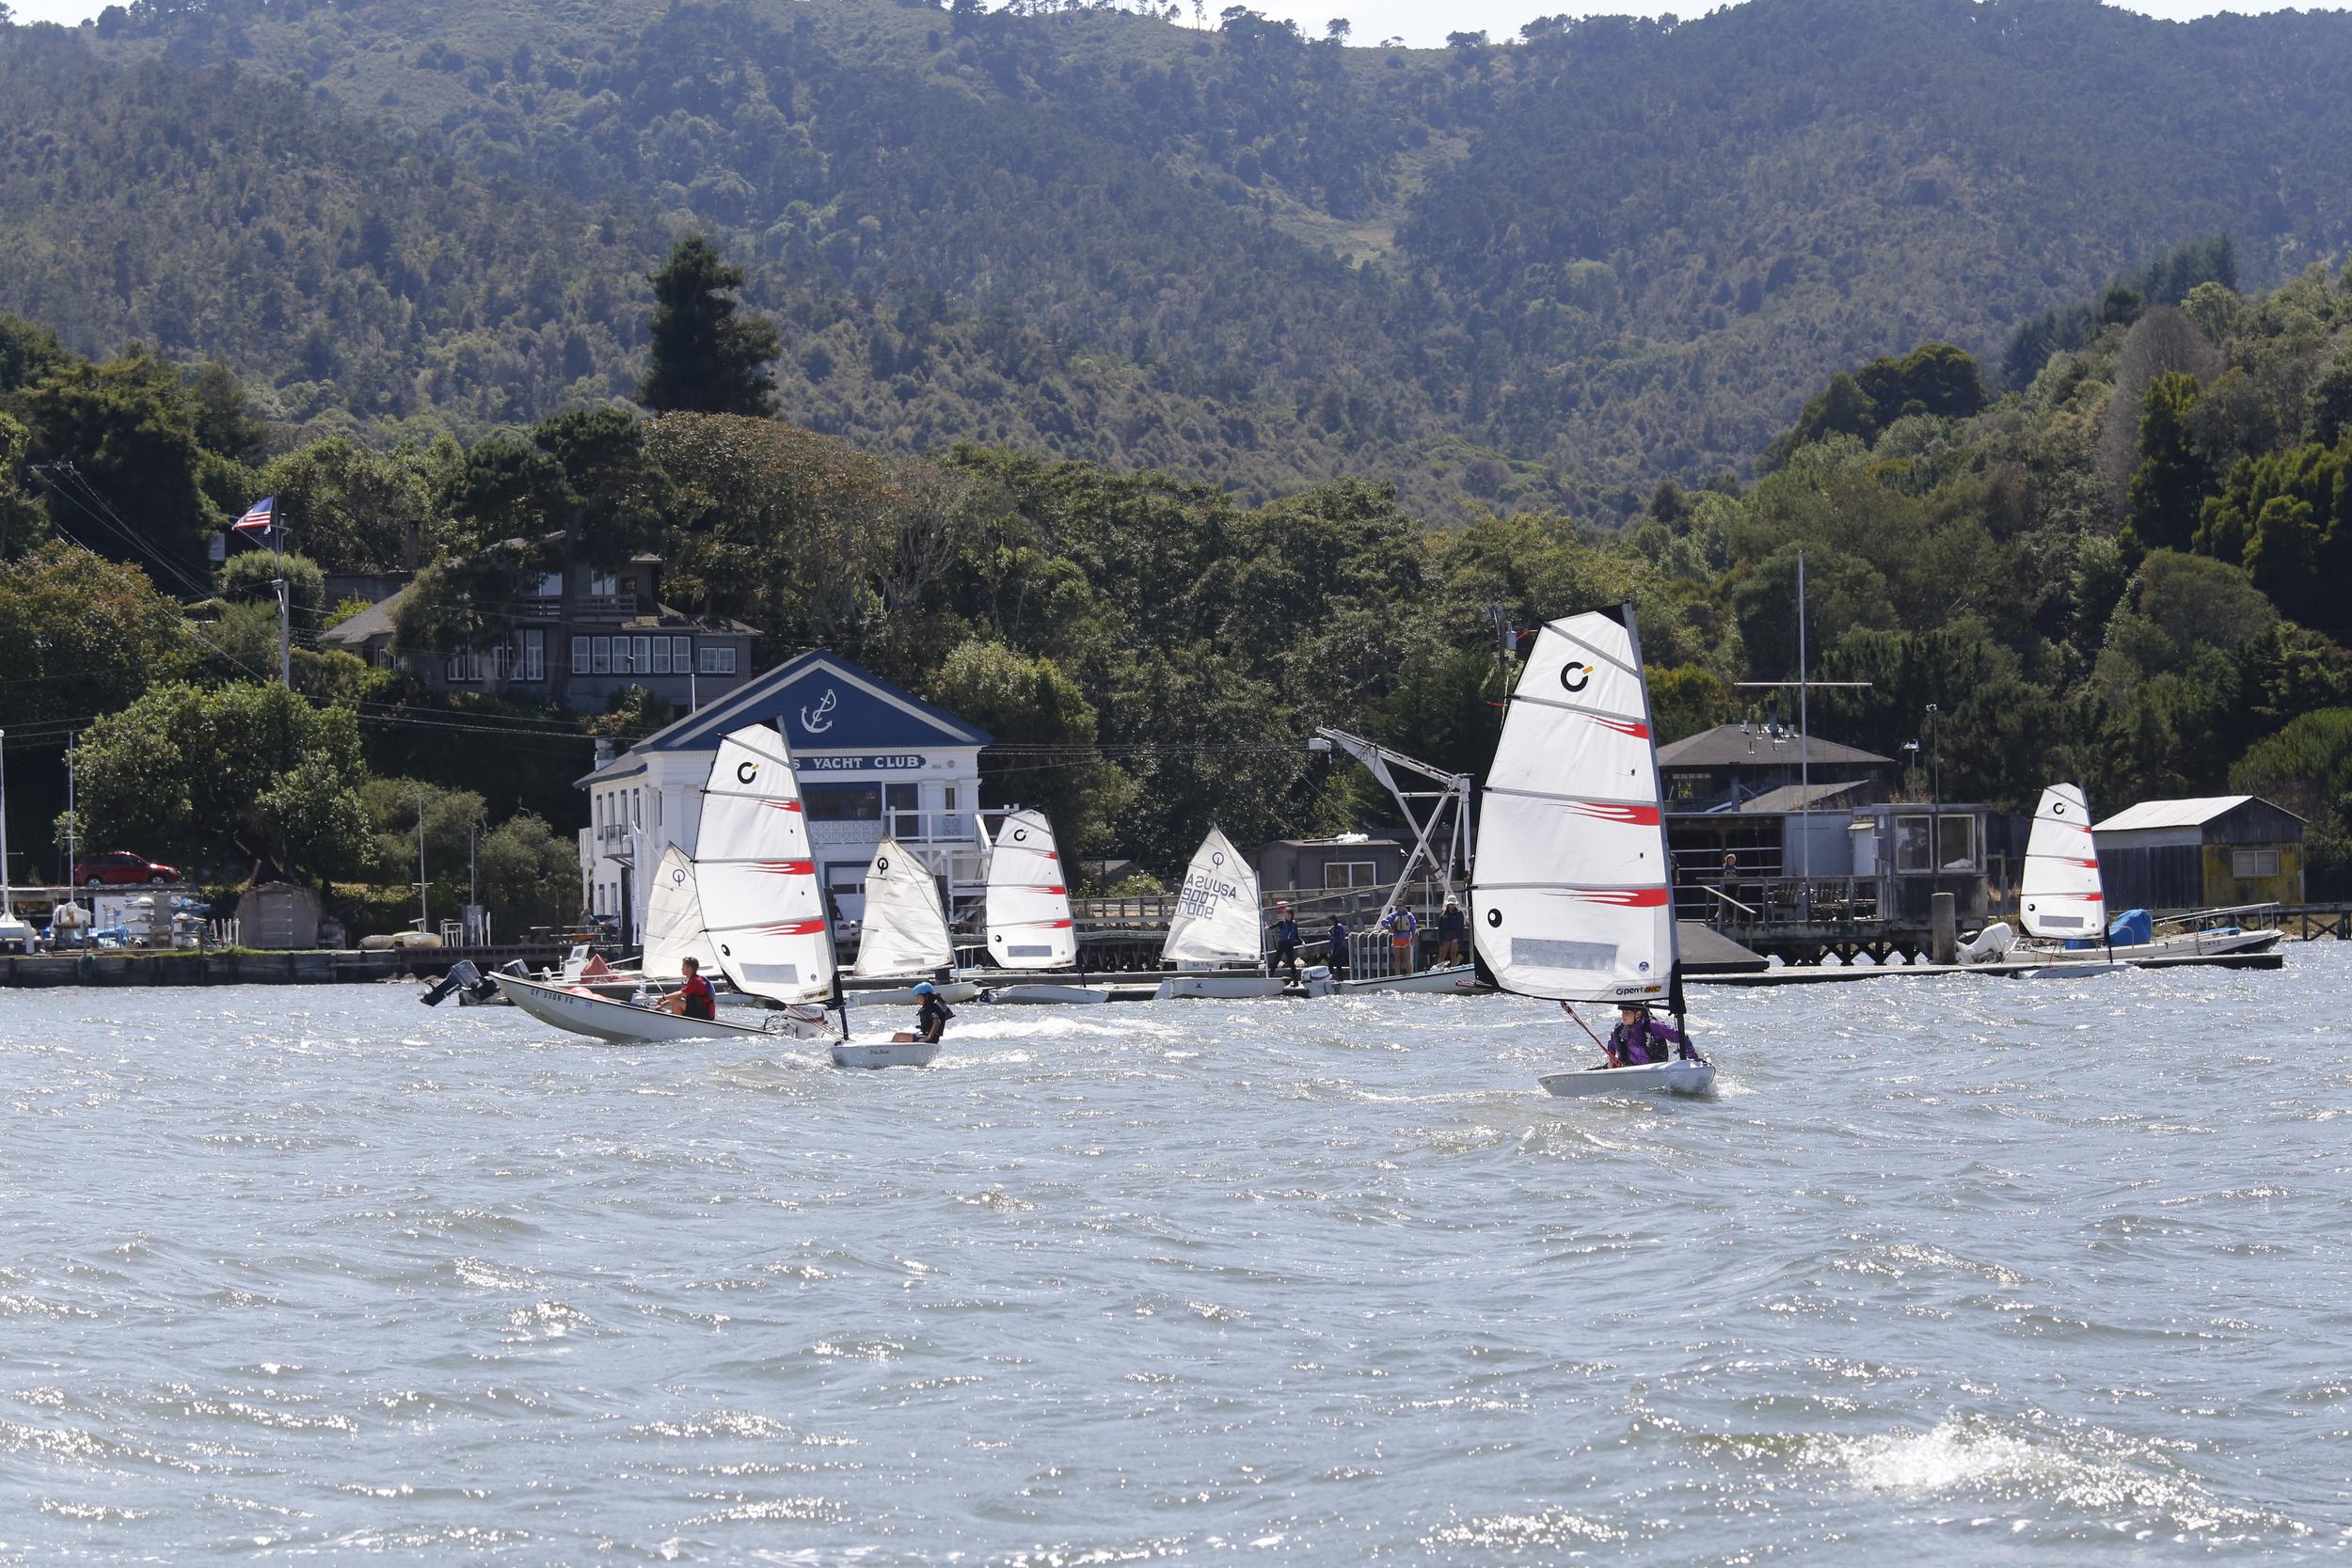 Youth Sailing Summer Camp Program